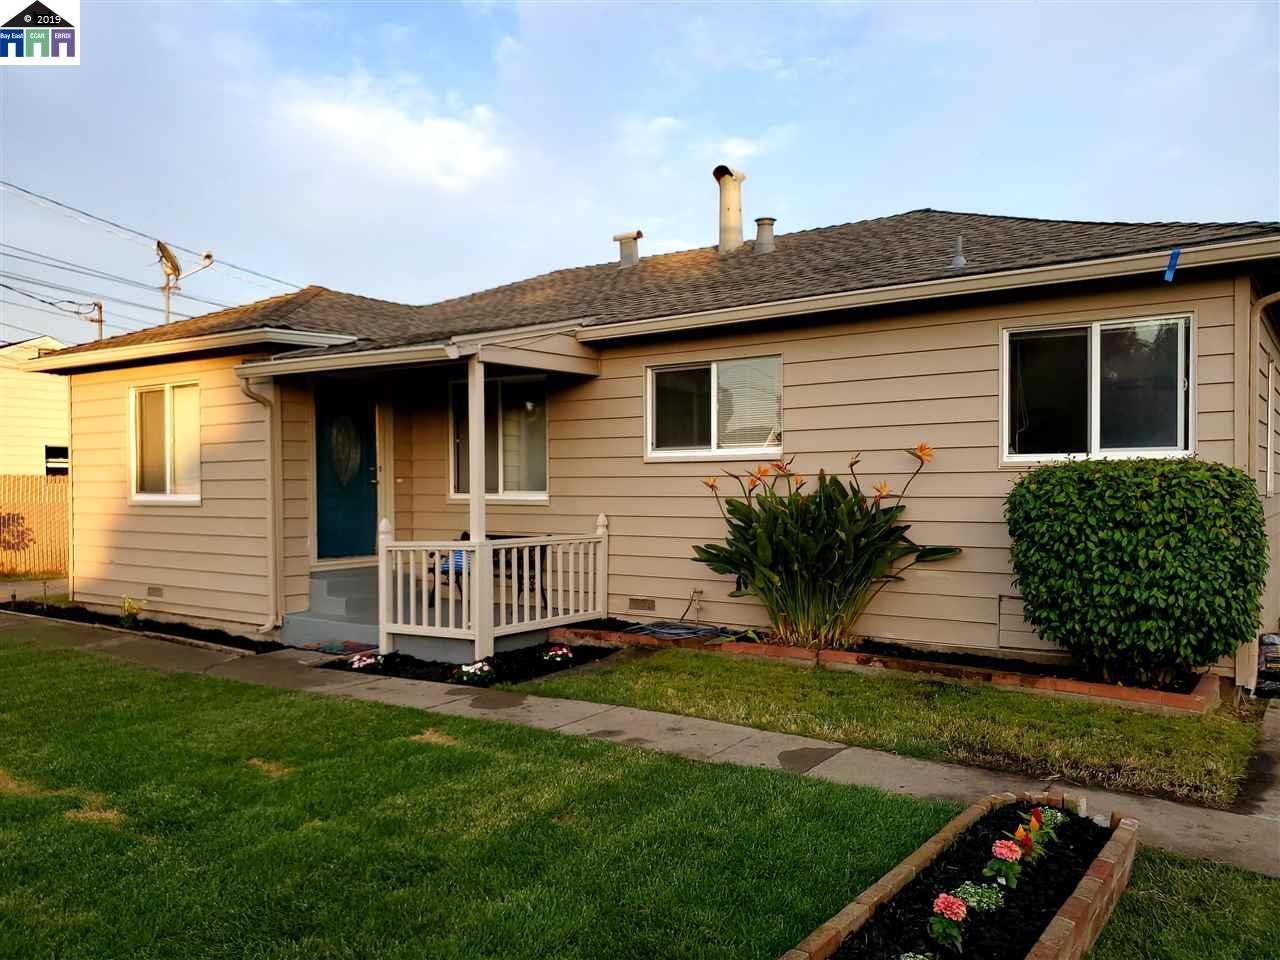 2540 W Ave 134TH San Leandro, CA 94577